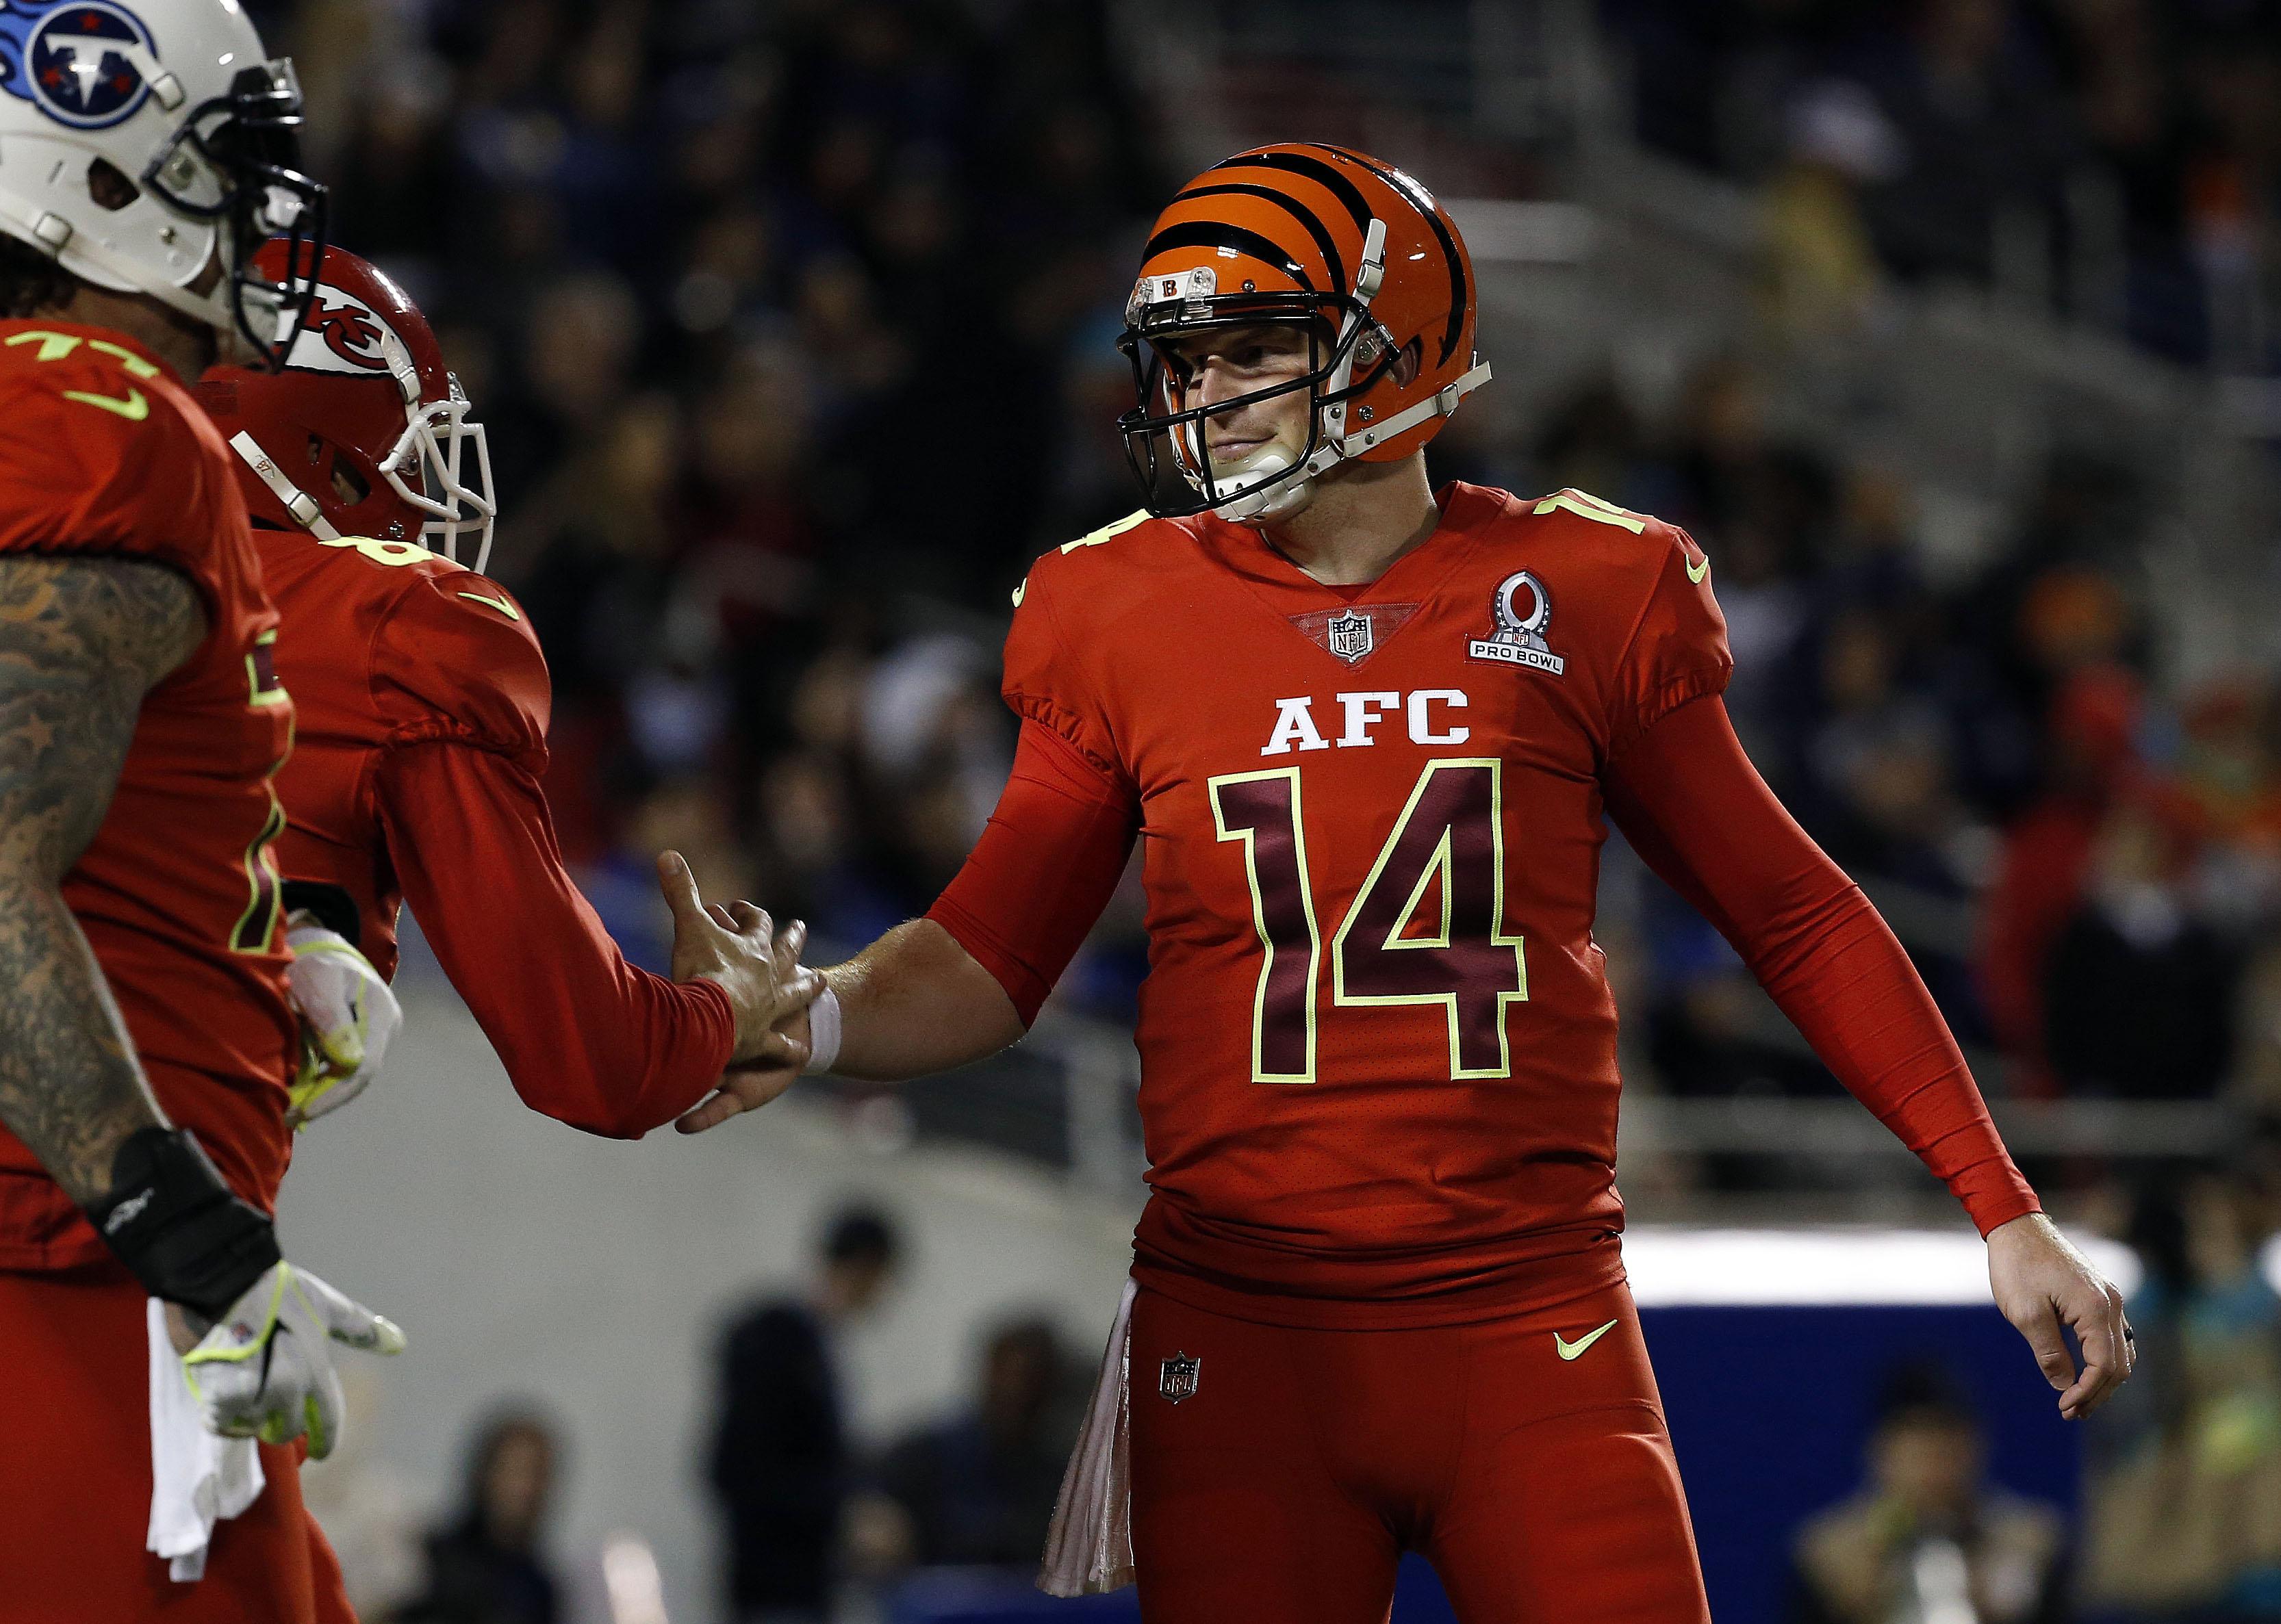 Bowl Game Schedule 2017 >> Bengals' Dalton, Atkins Shine In AFC Pro Bowl Win